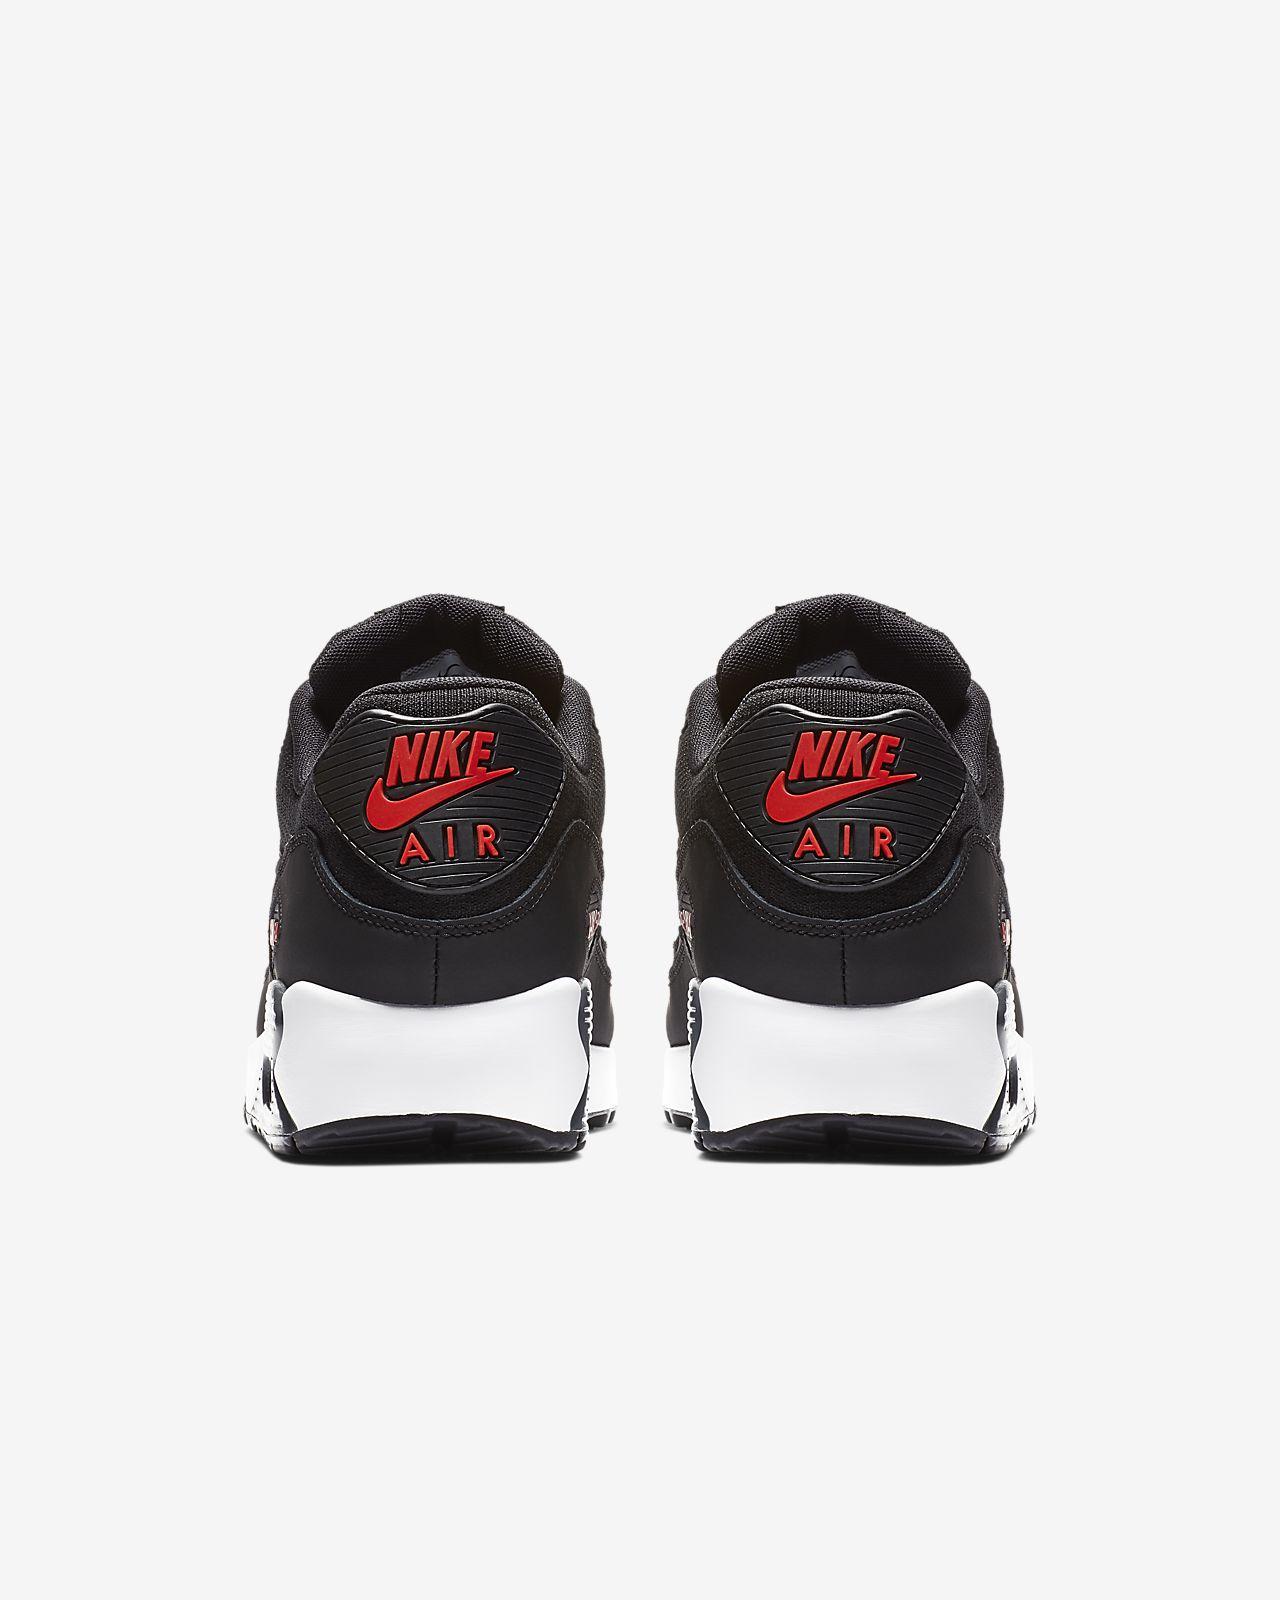 in stock 88e02 190f2 ... Nike Air Max 90 SE Men s Shoe